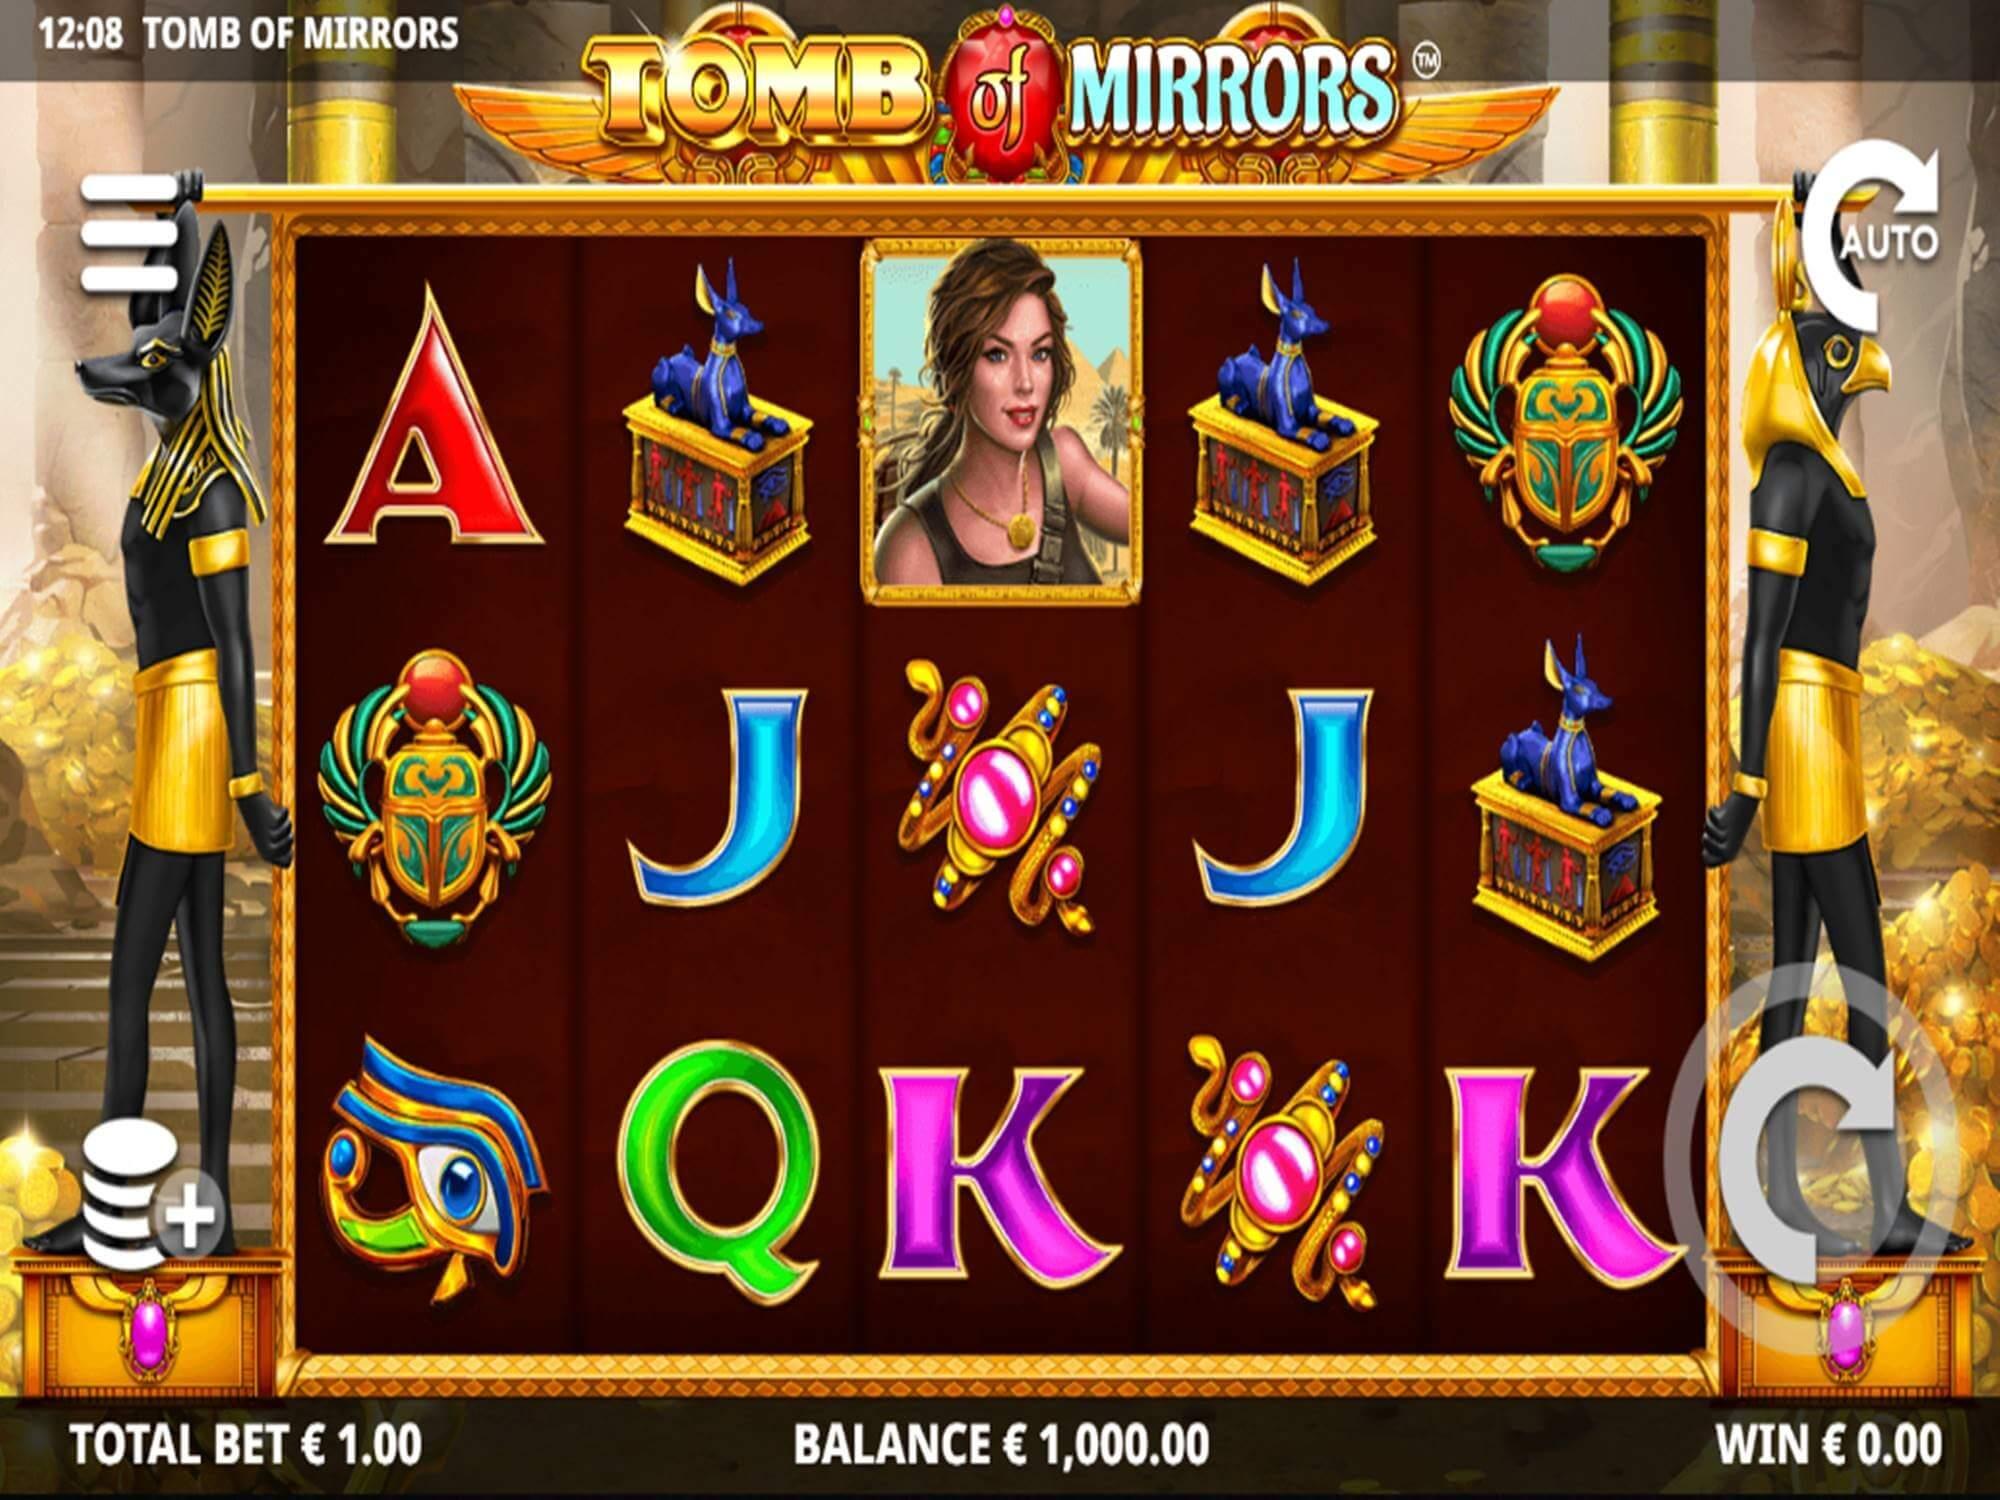 Tomb of Mirrors Slot Bonus